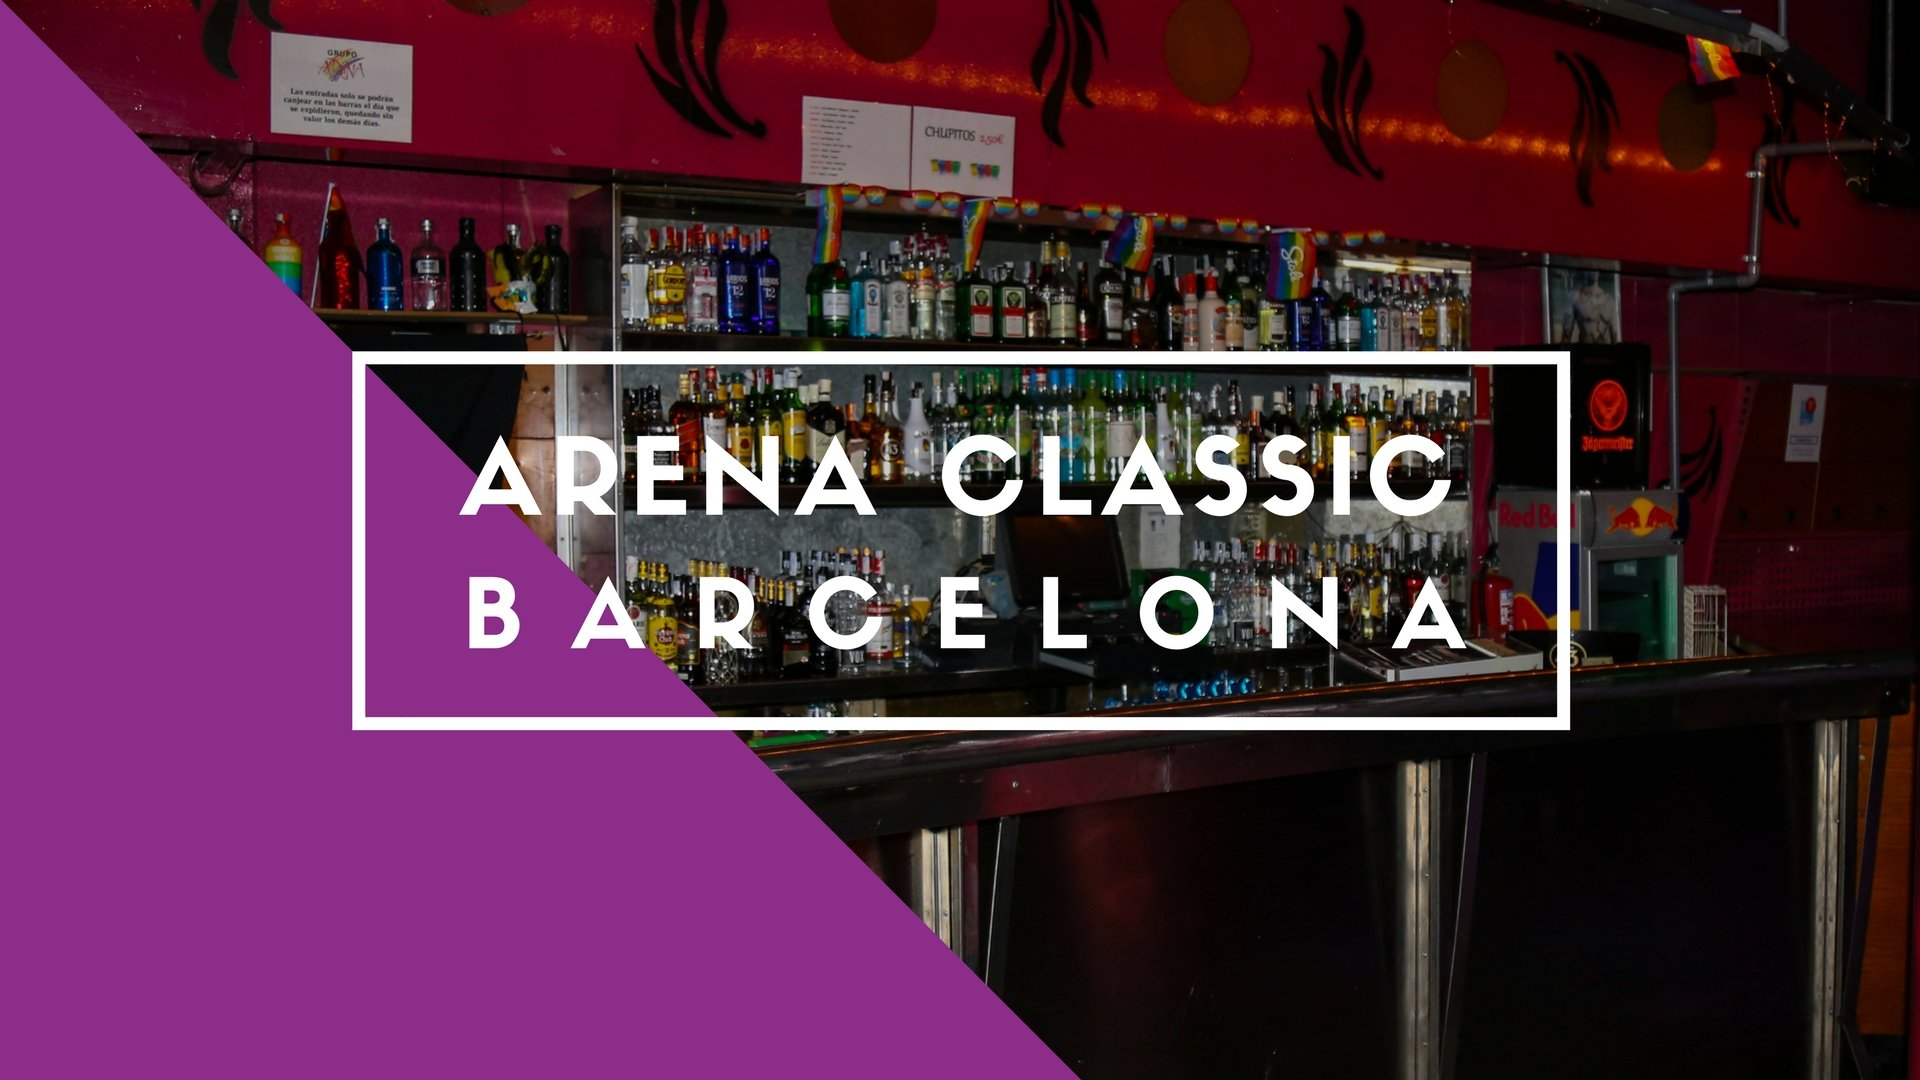 Arena Classic, Barcelona